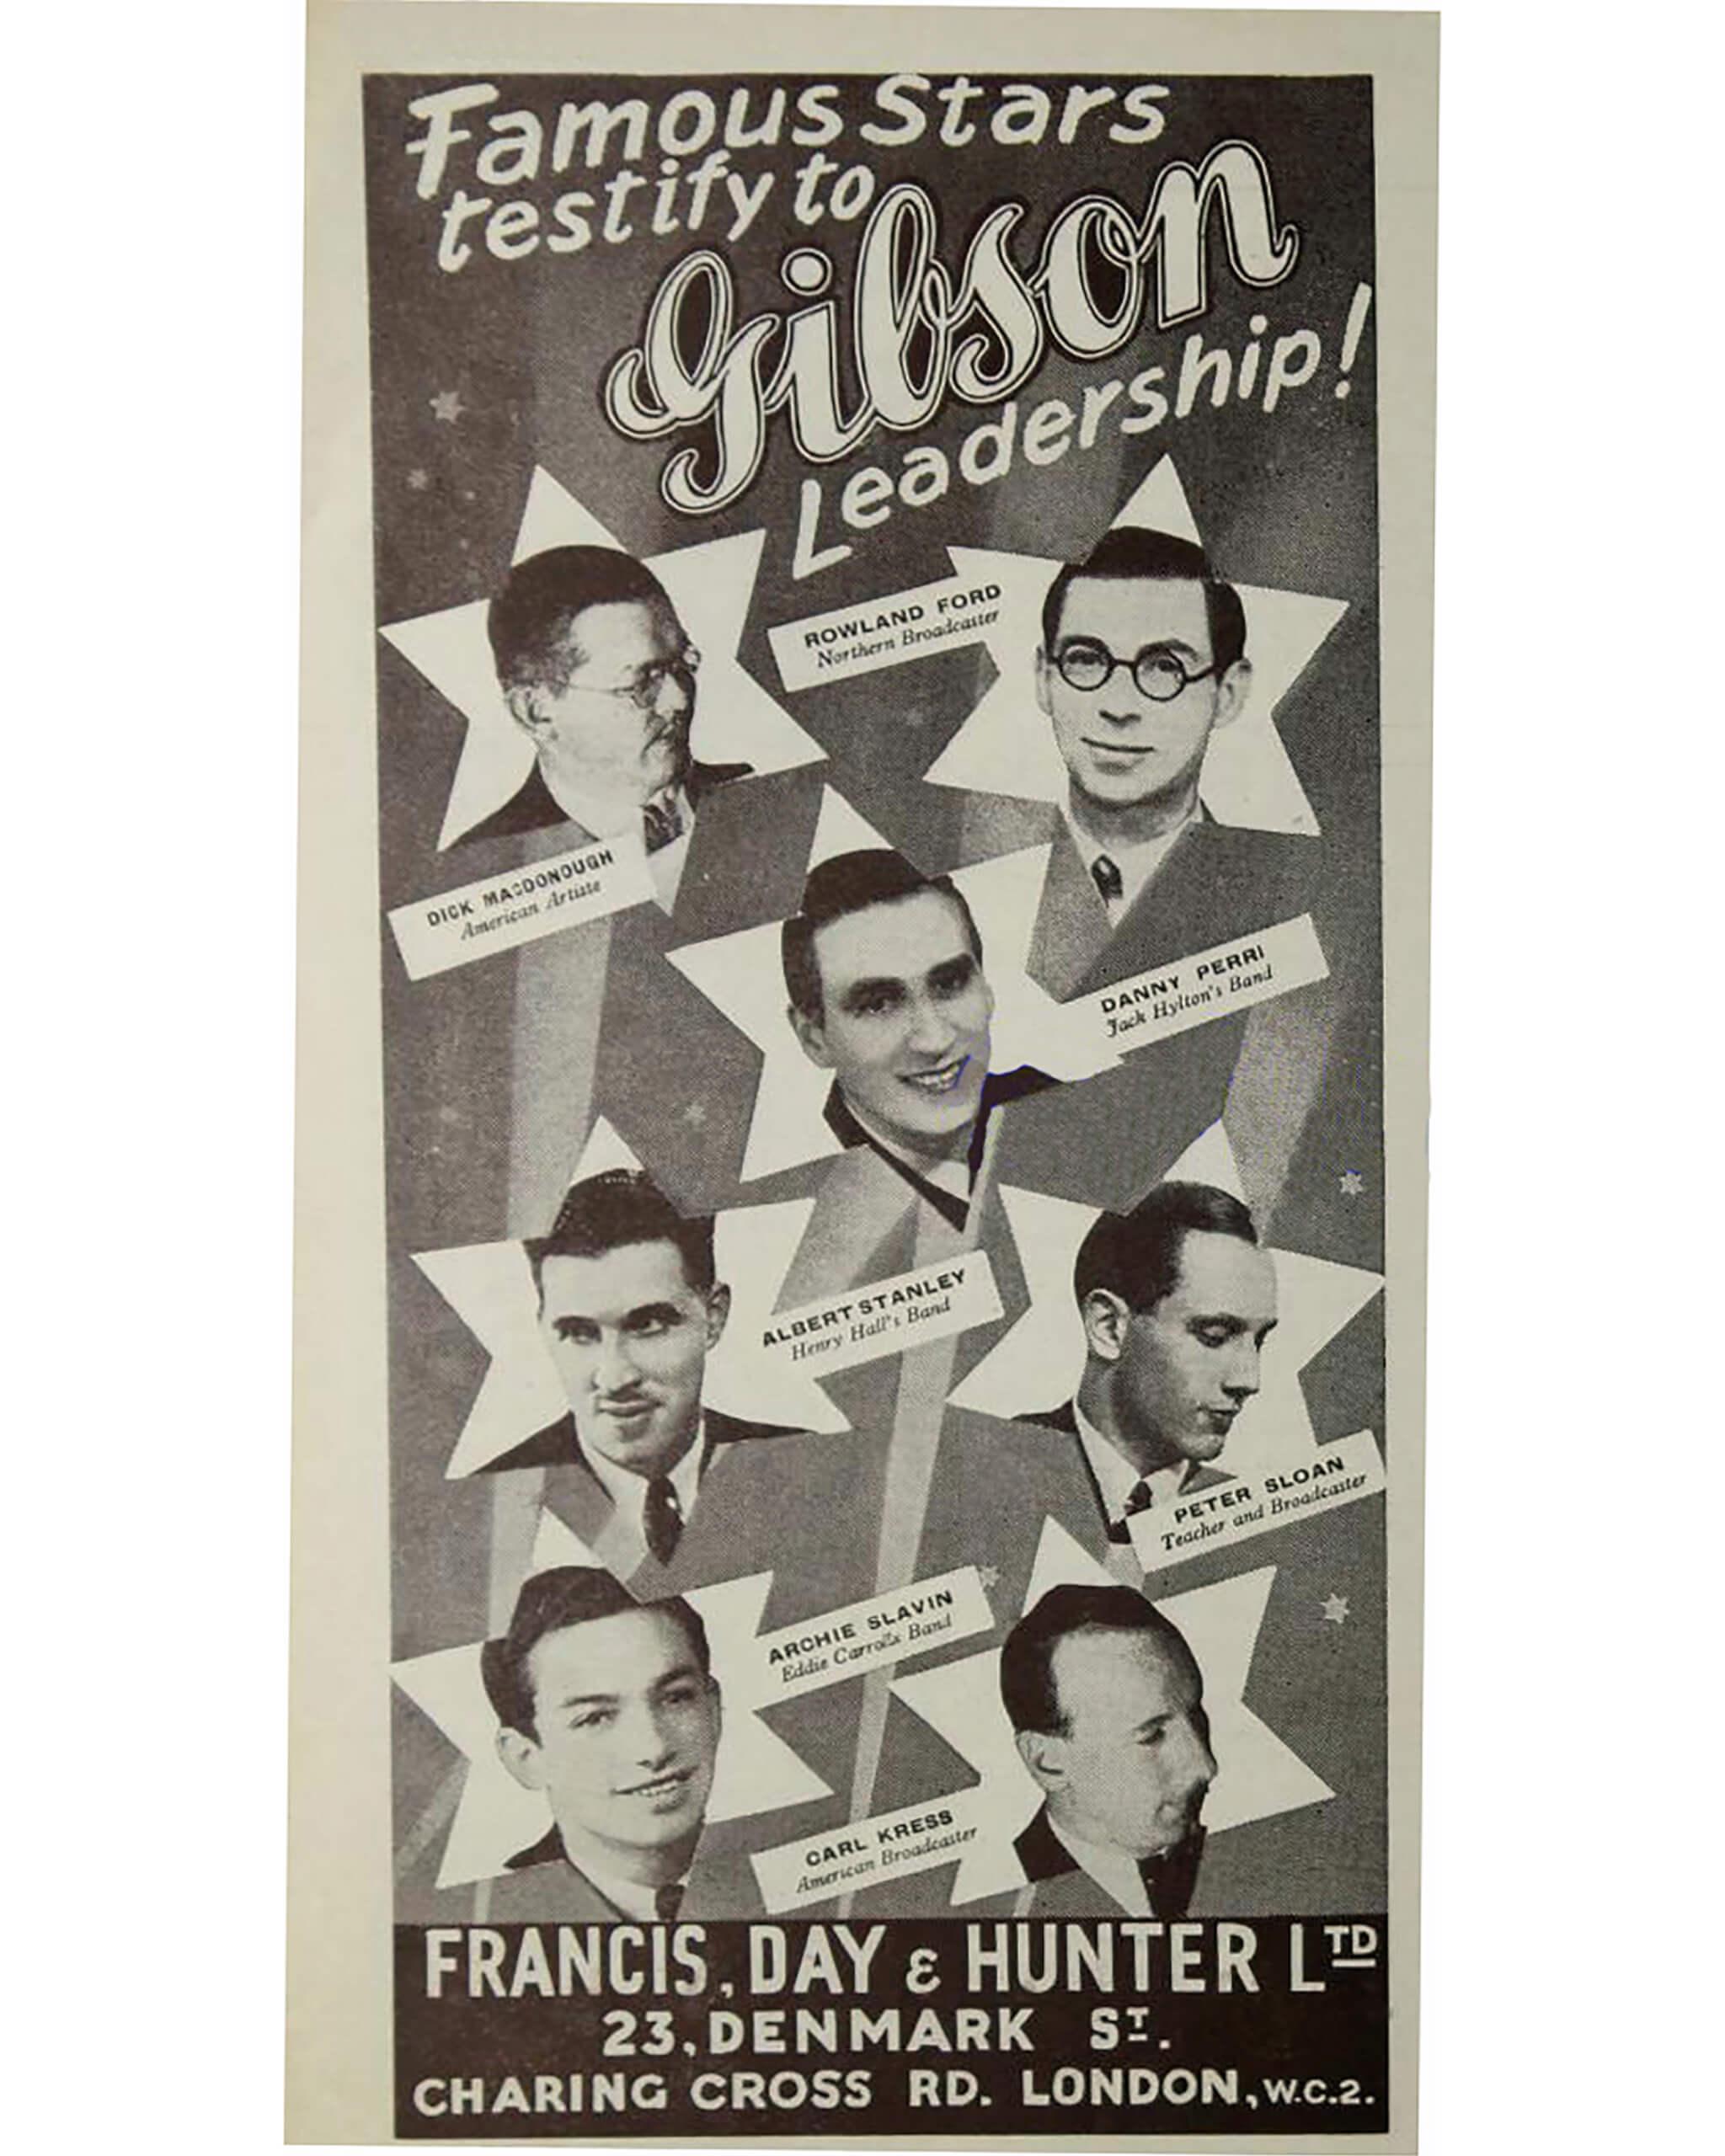 History Of Denmark Street Gibson Ad